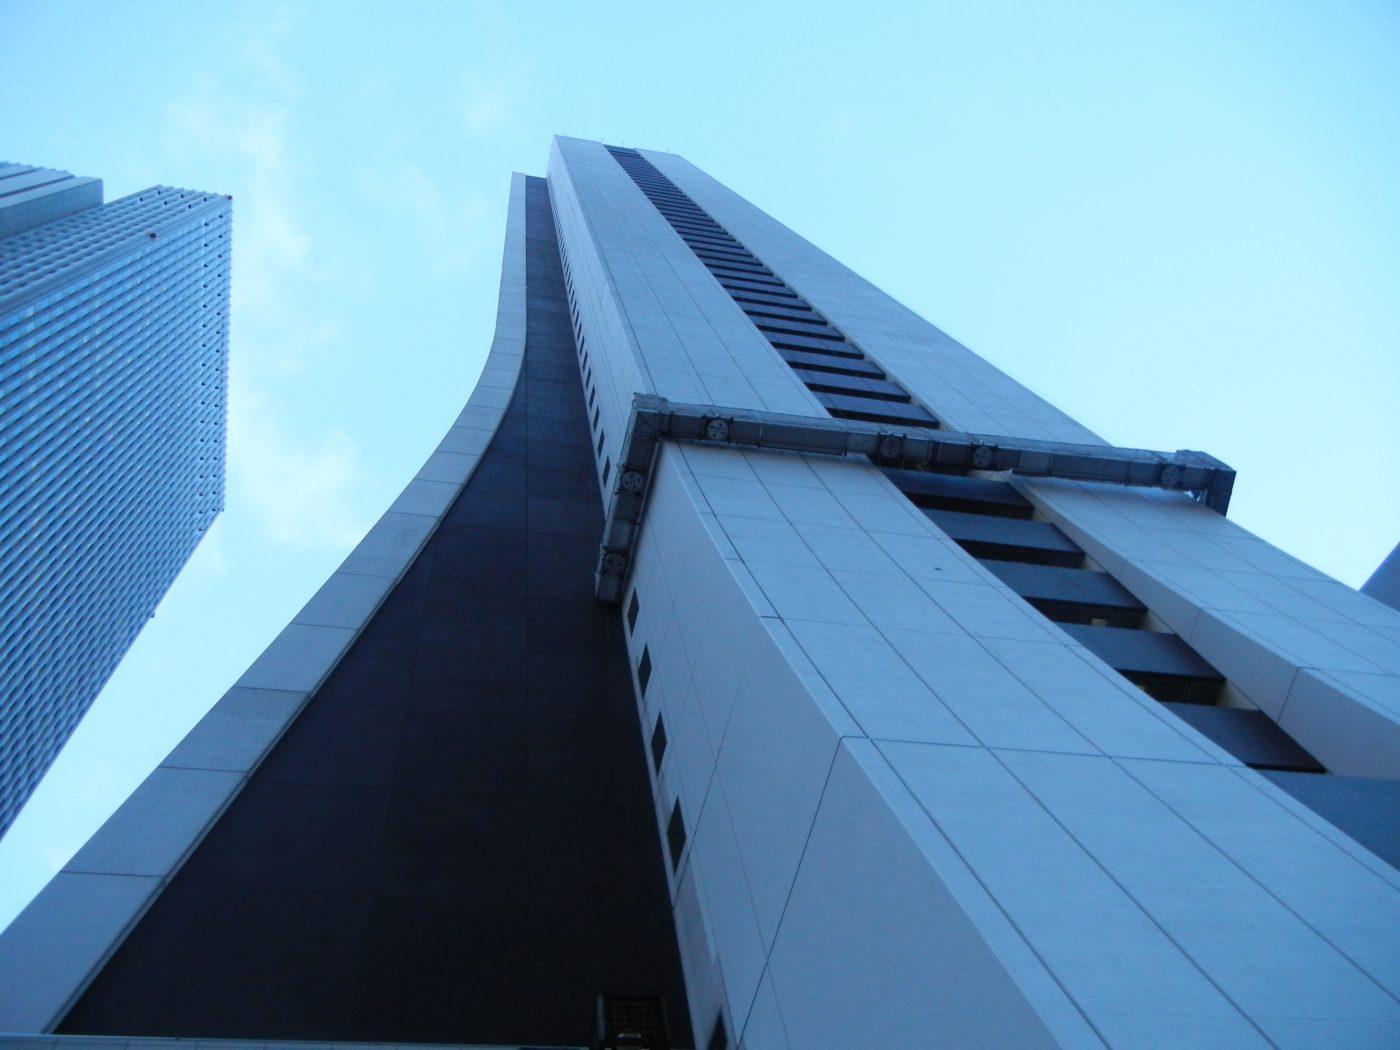 4. Tokyo (1. Sompo Museum)